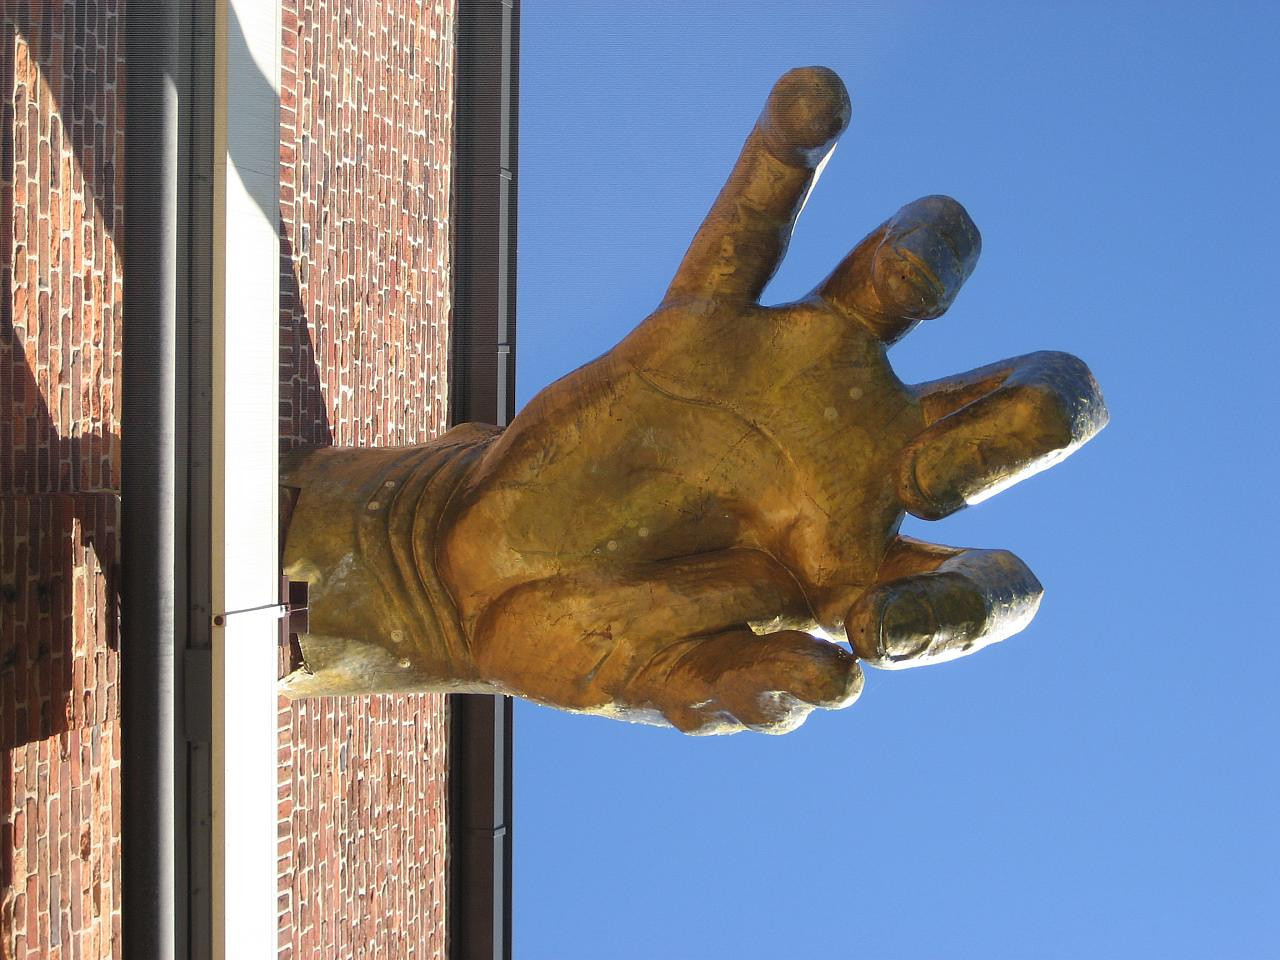 Hand from below